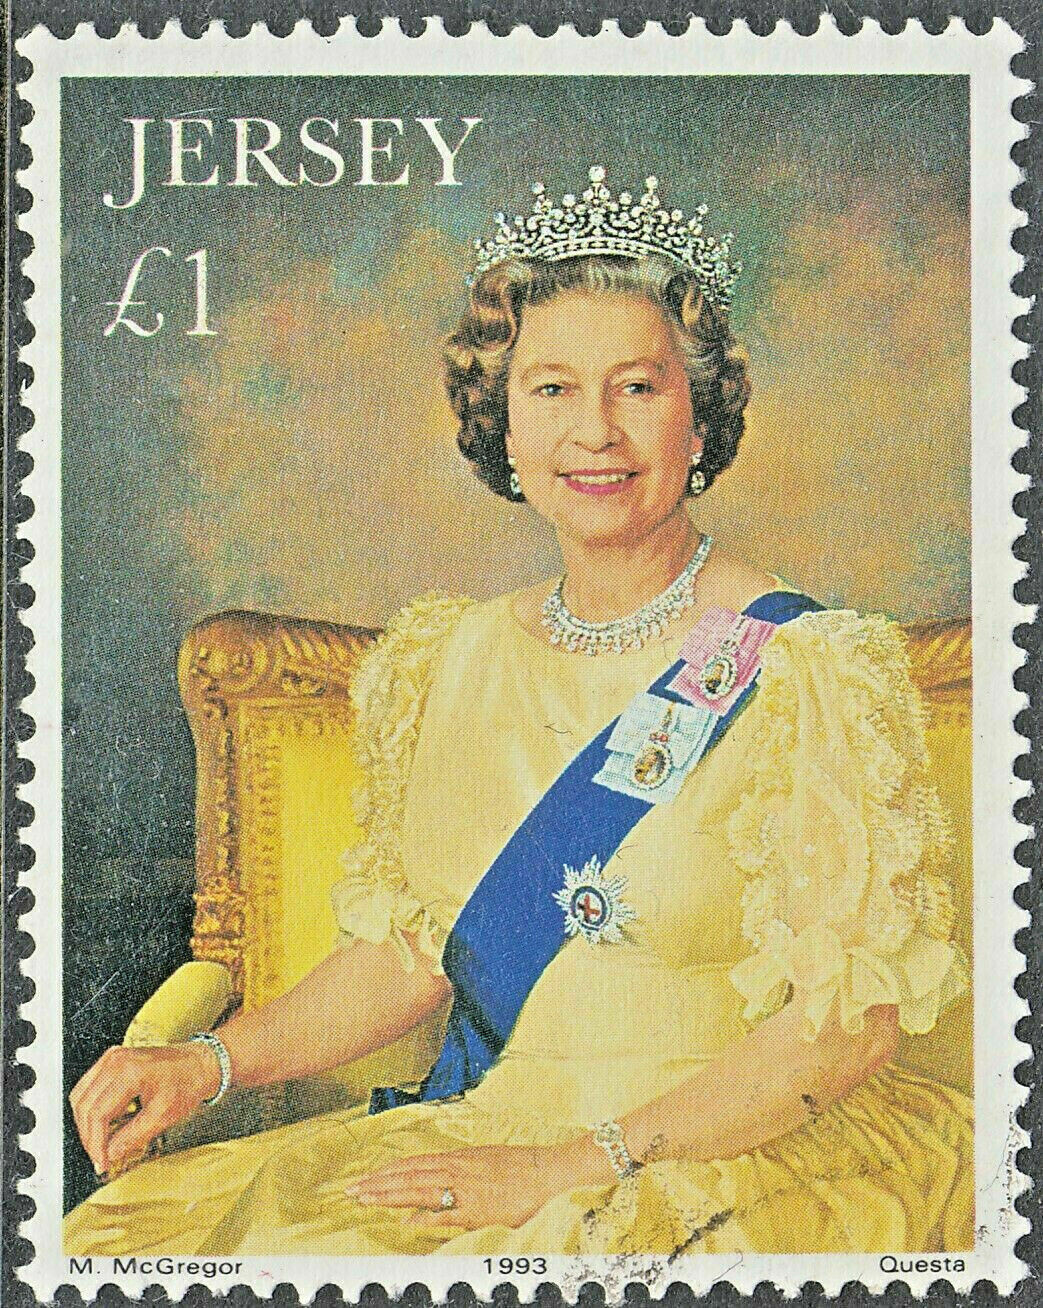 Jersey 1993 QEII £1 40th Anniversary of the Coronation VFU